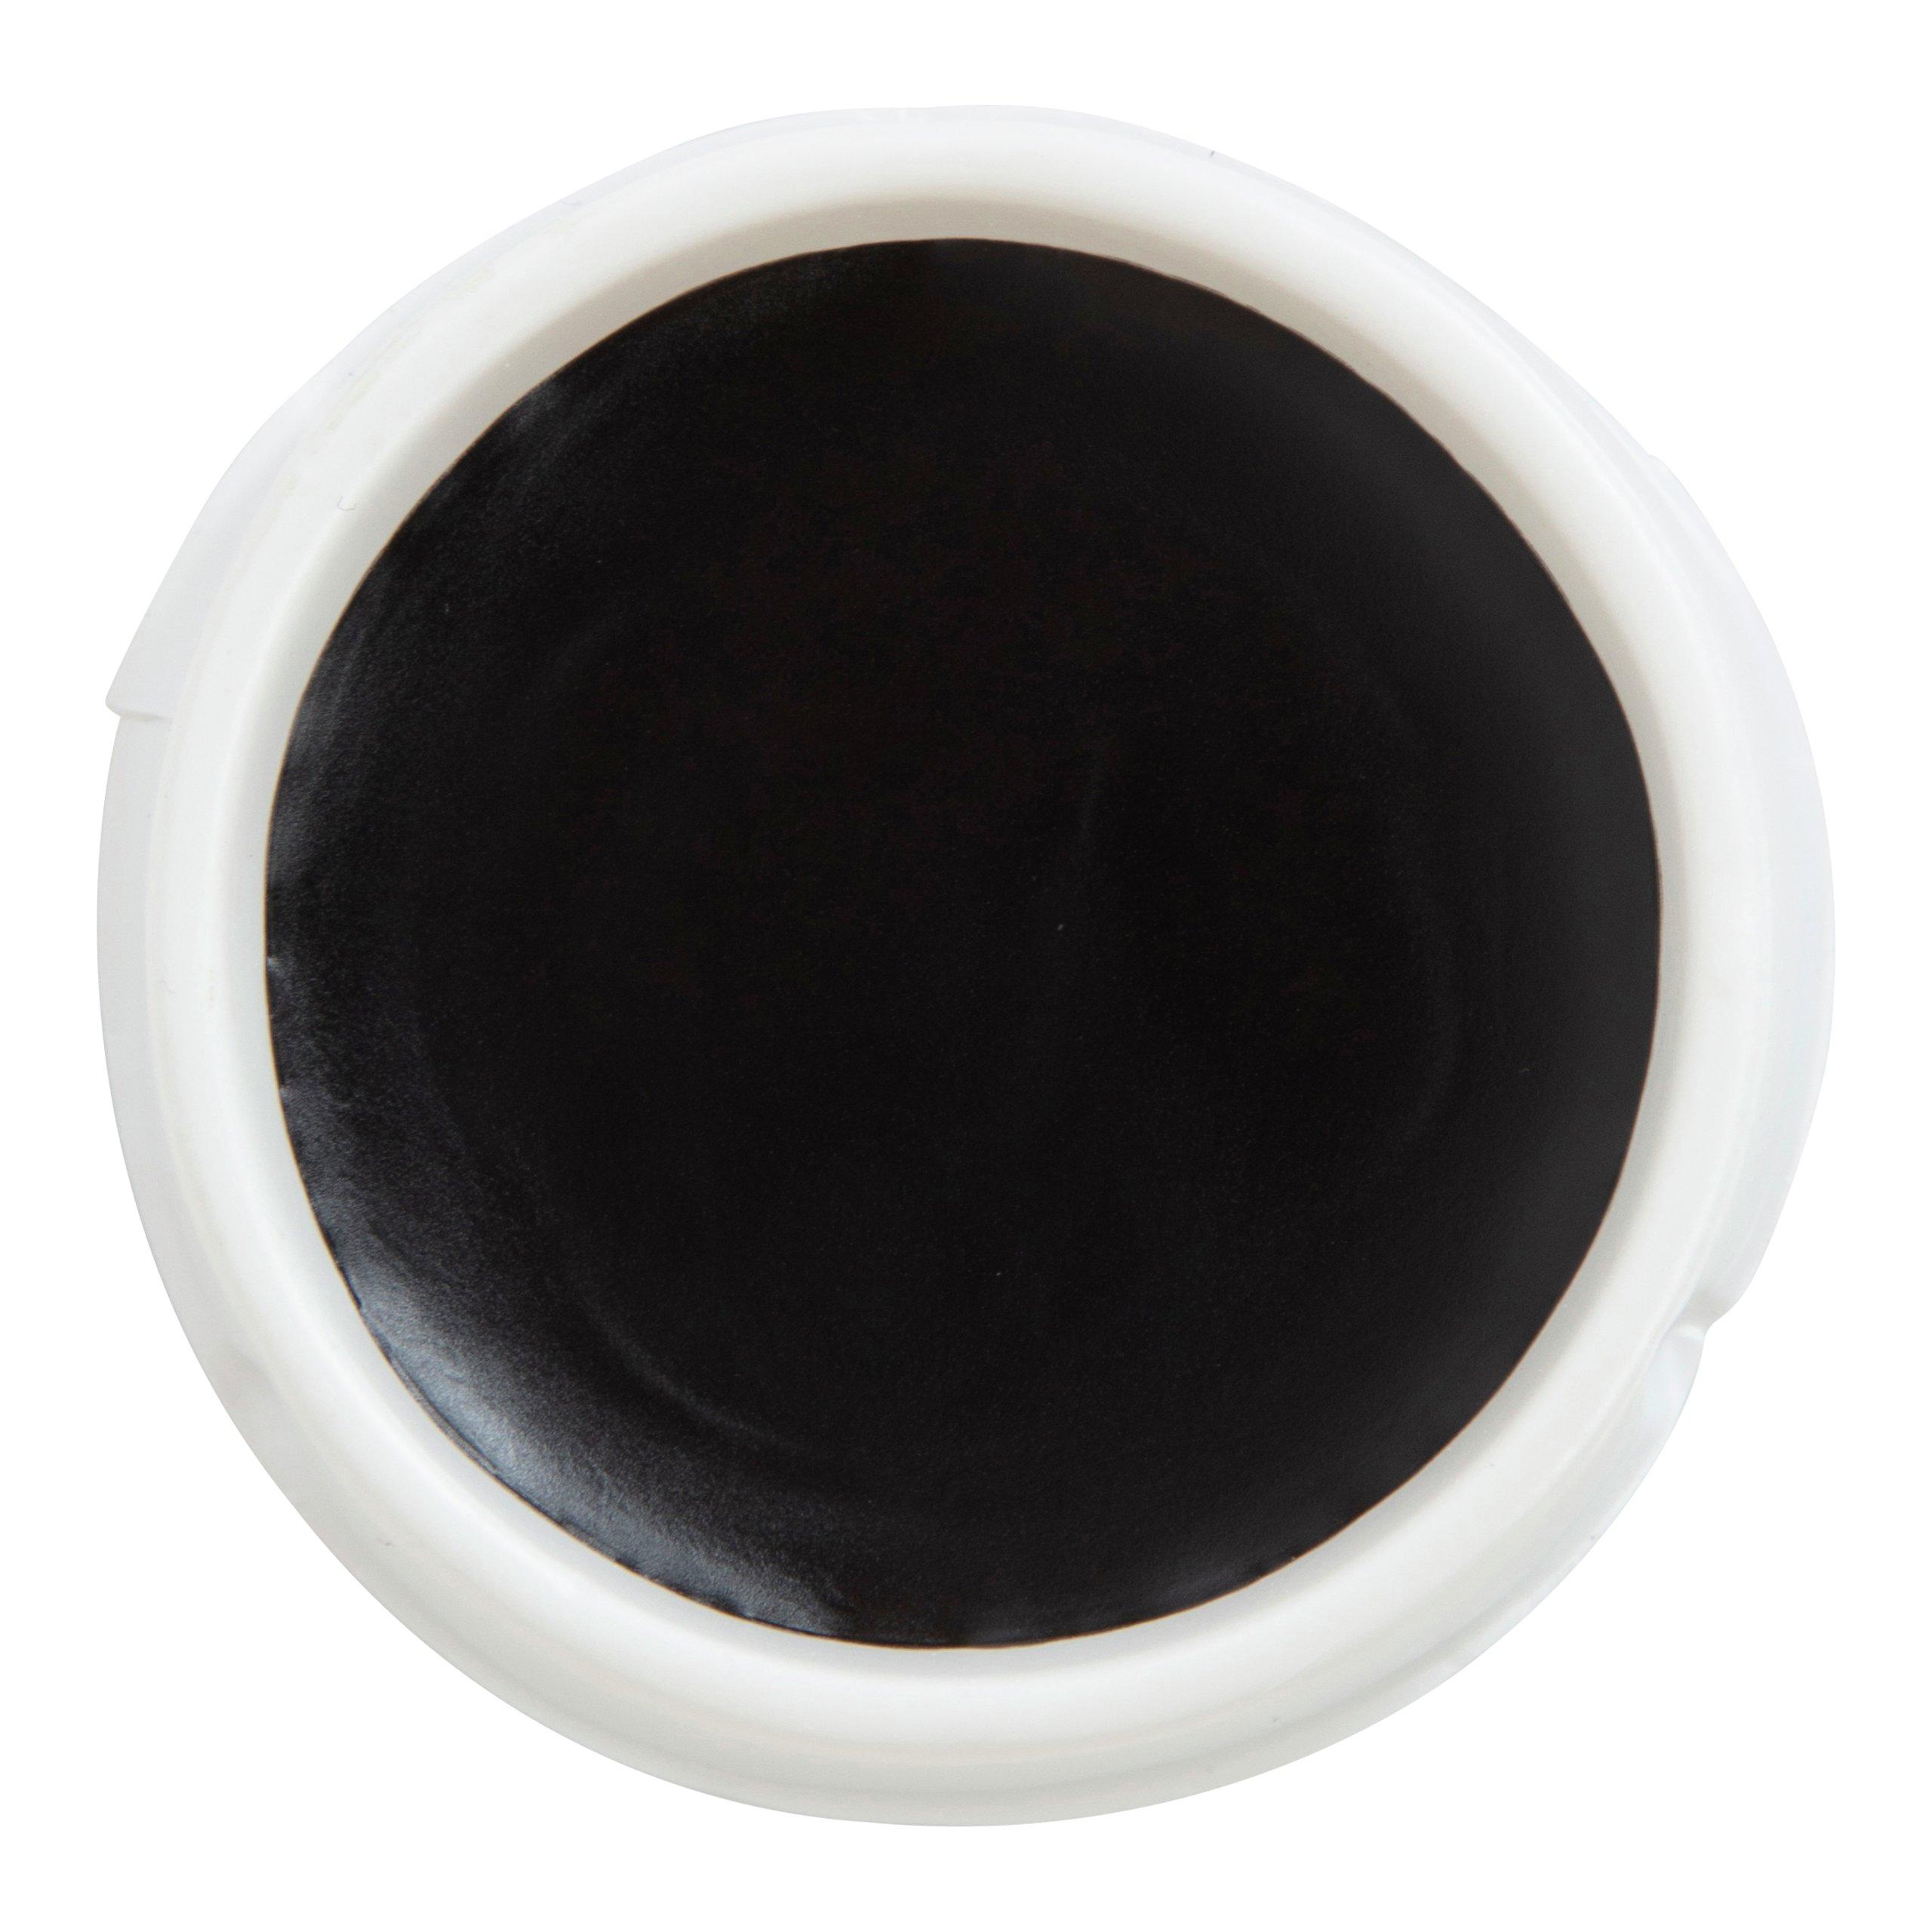 SMINKE HALLOWEEN TOOTH BLACK-HAL2051